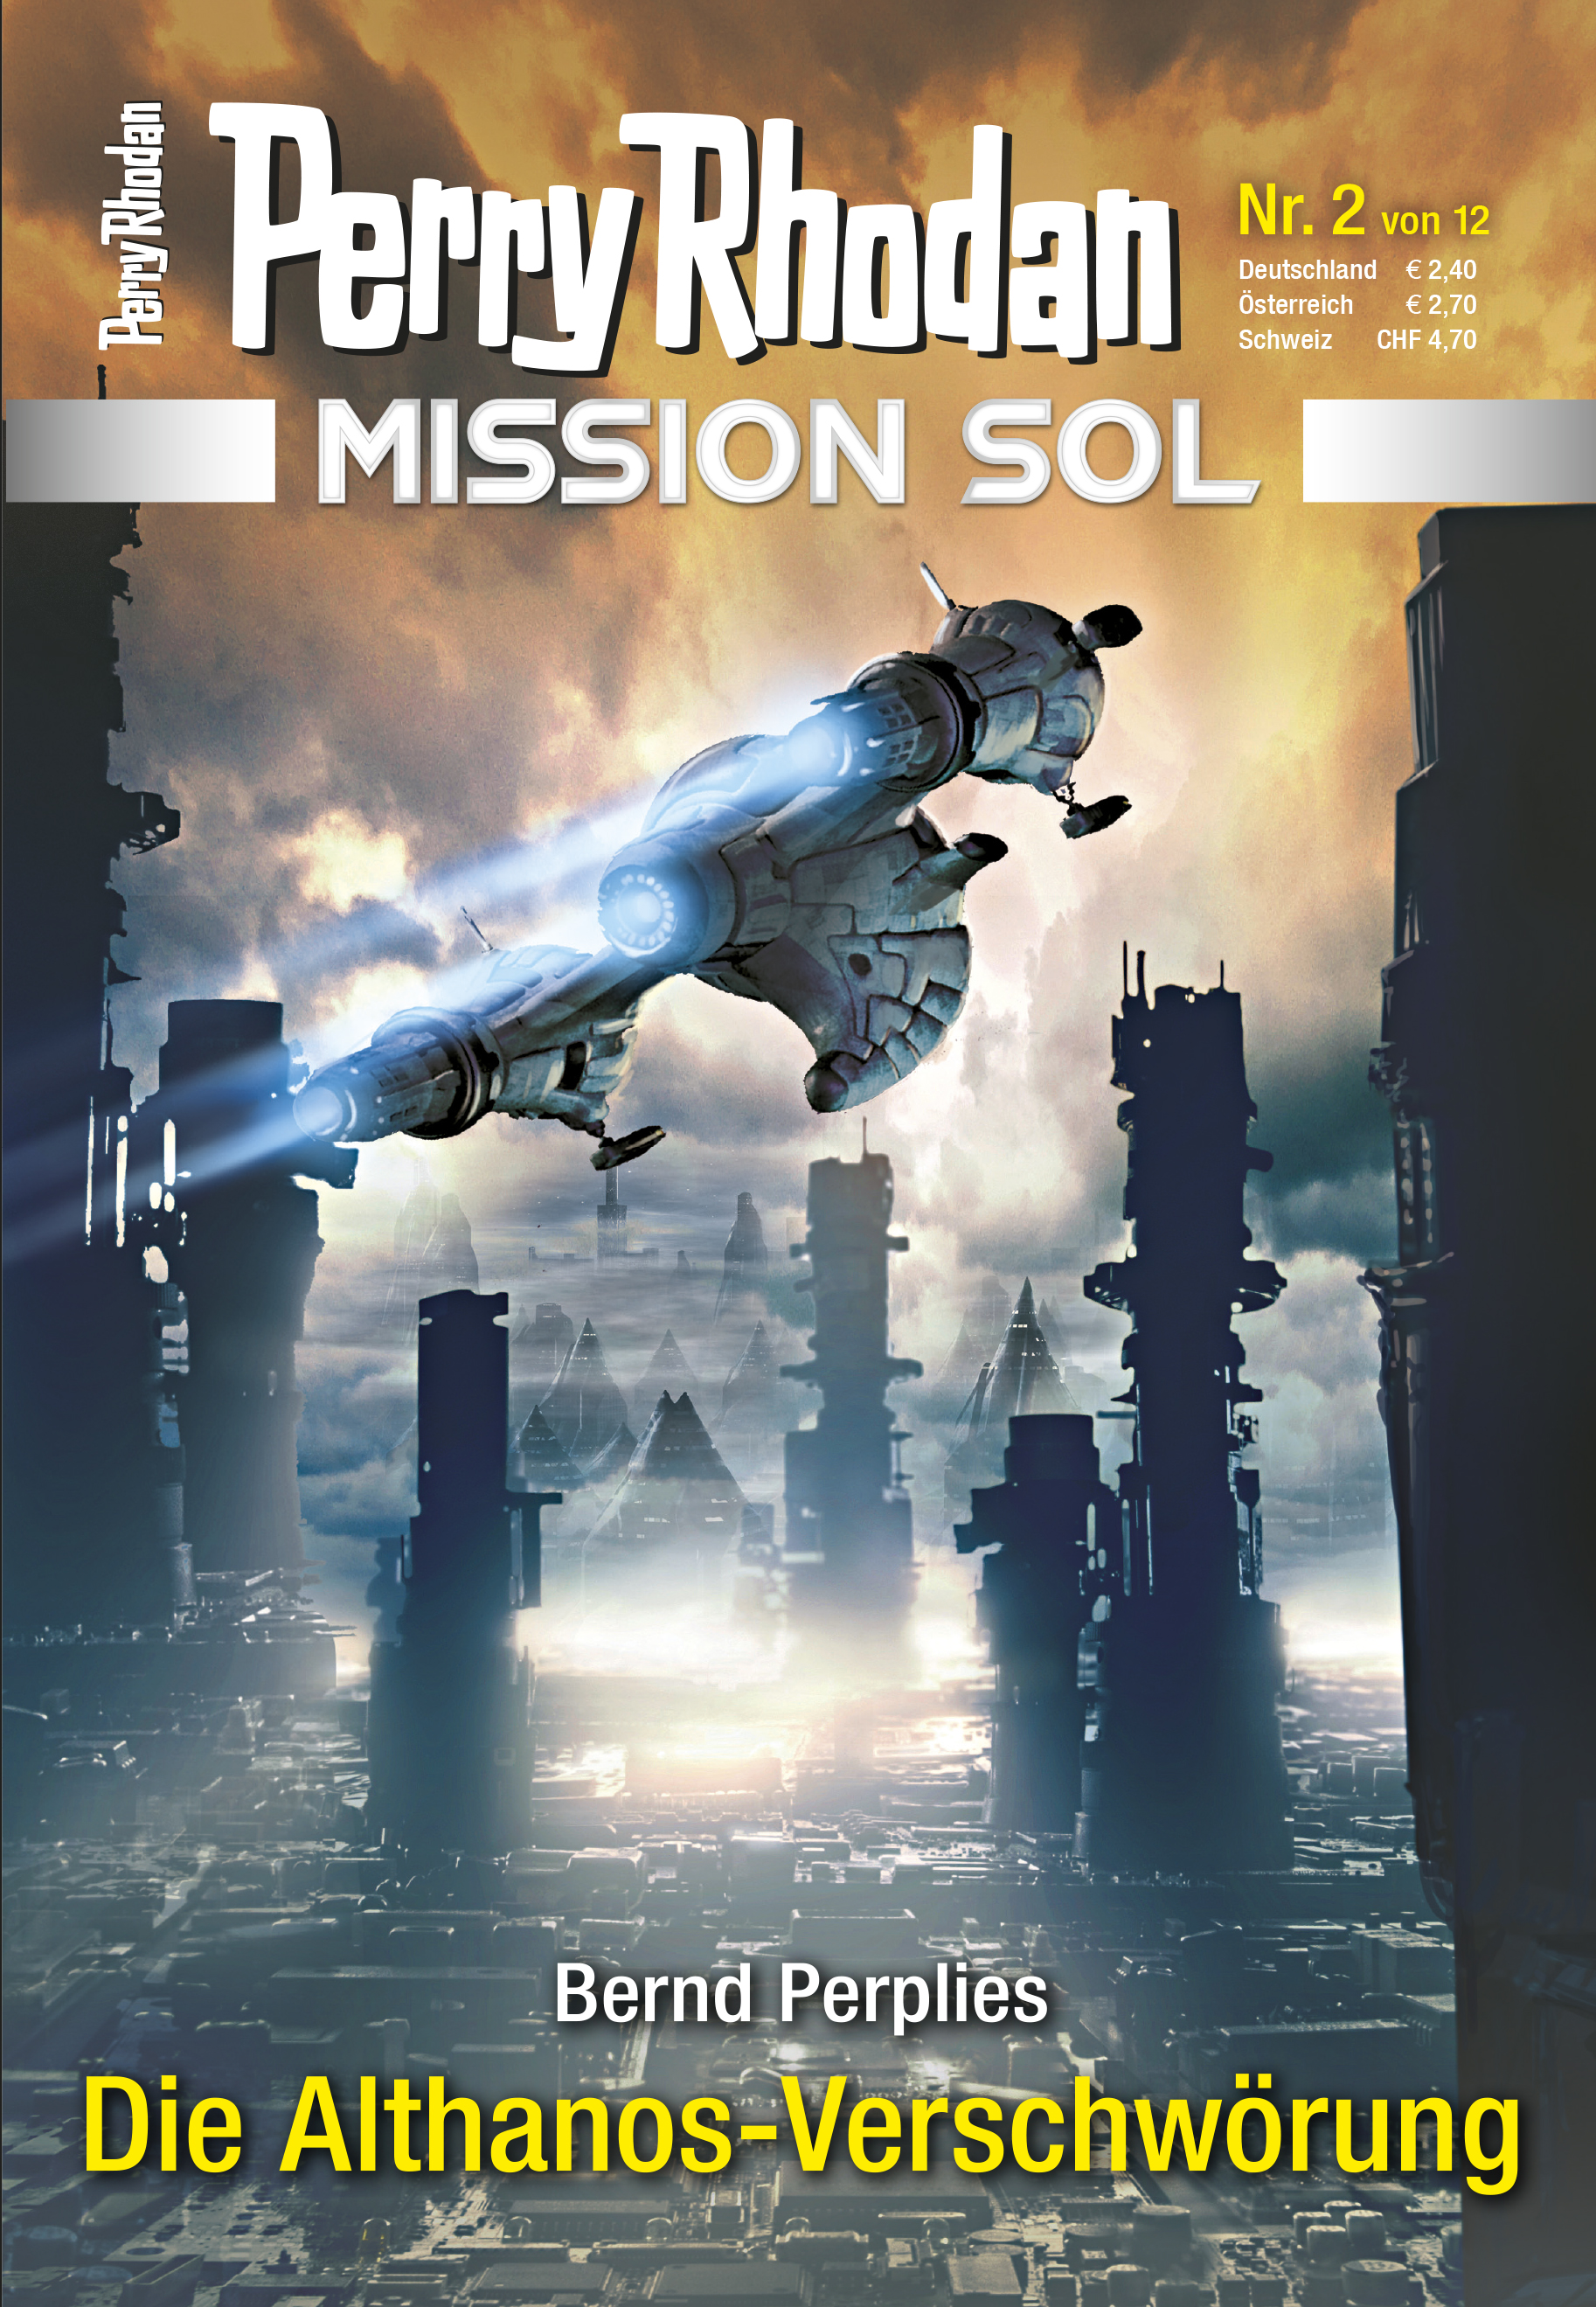 bernd_perplies_perry_rhodan_mission_sol_2_phantastik-autoren-netzwerk.jpg